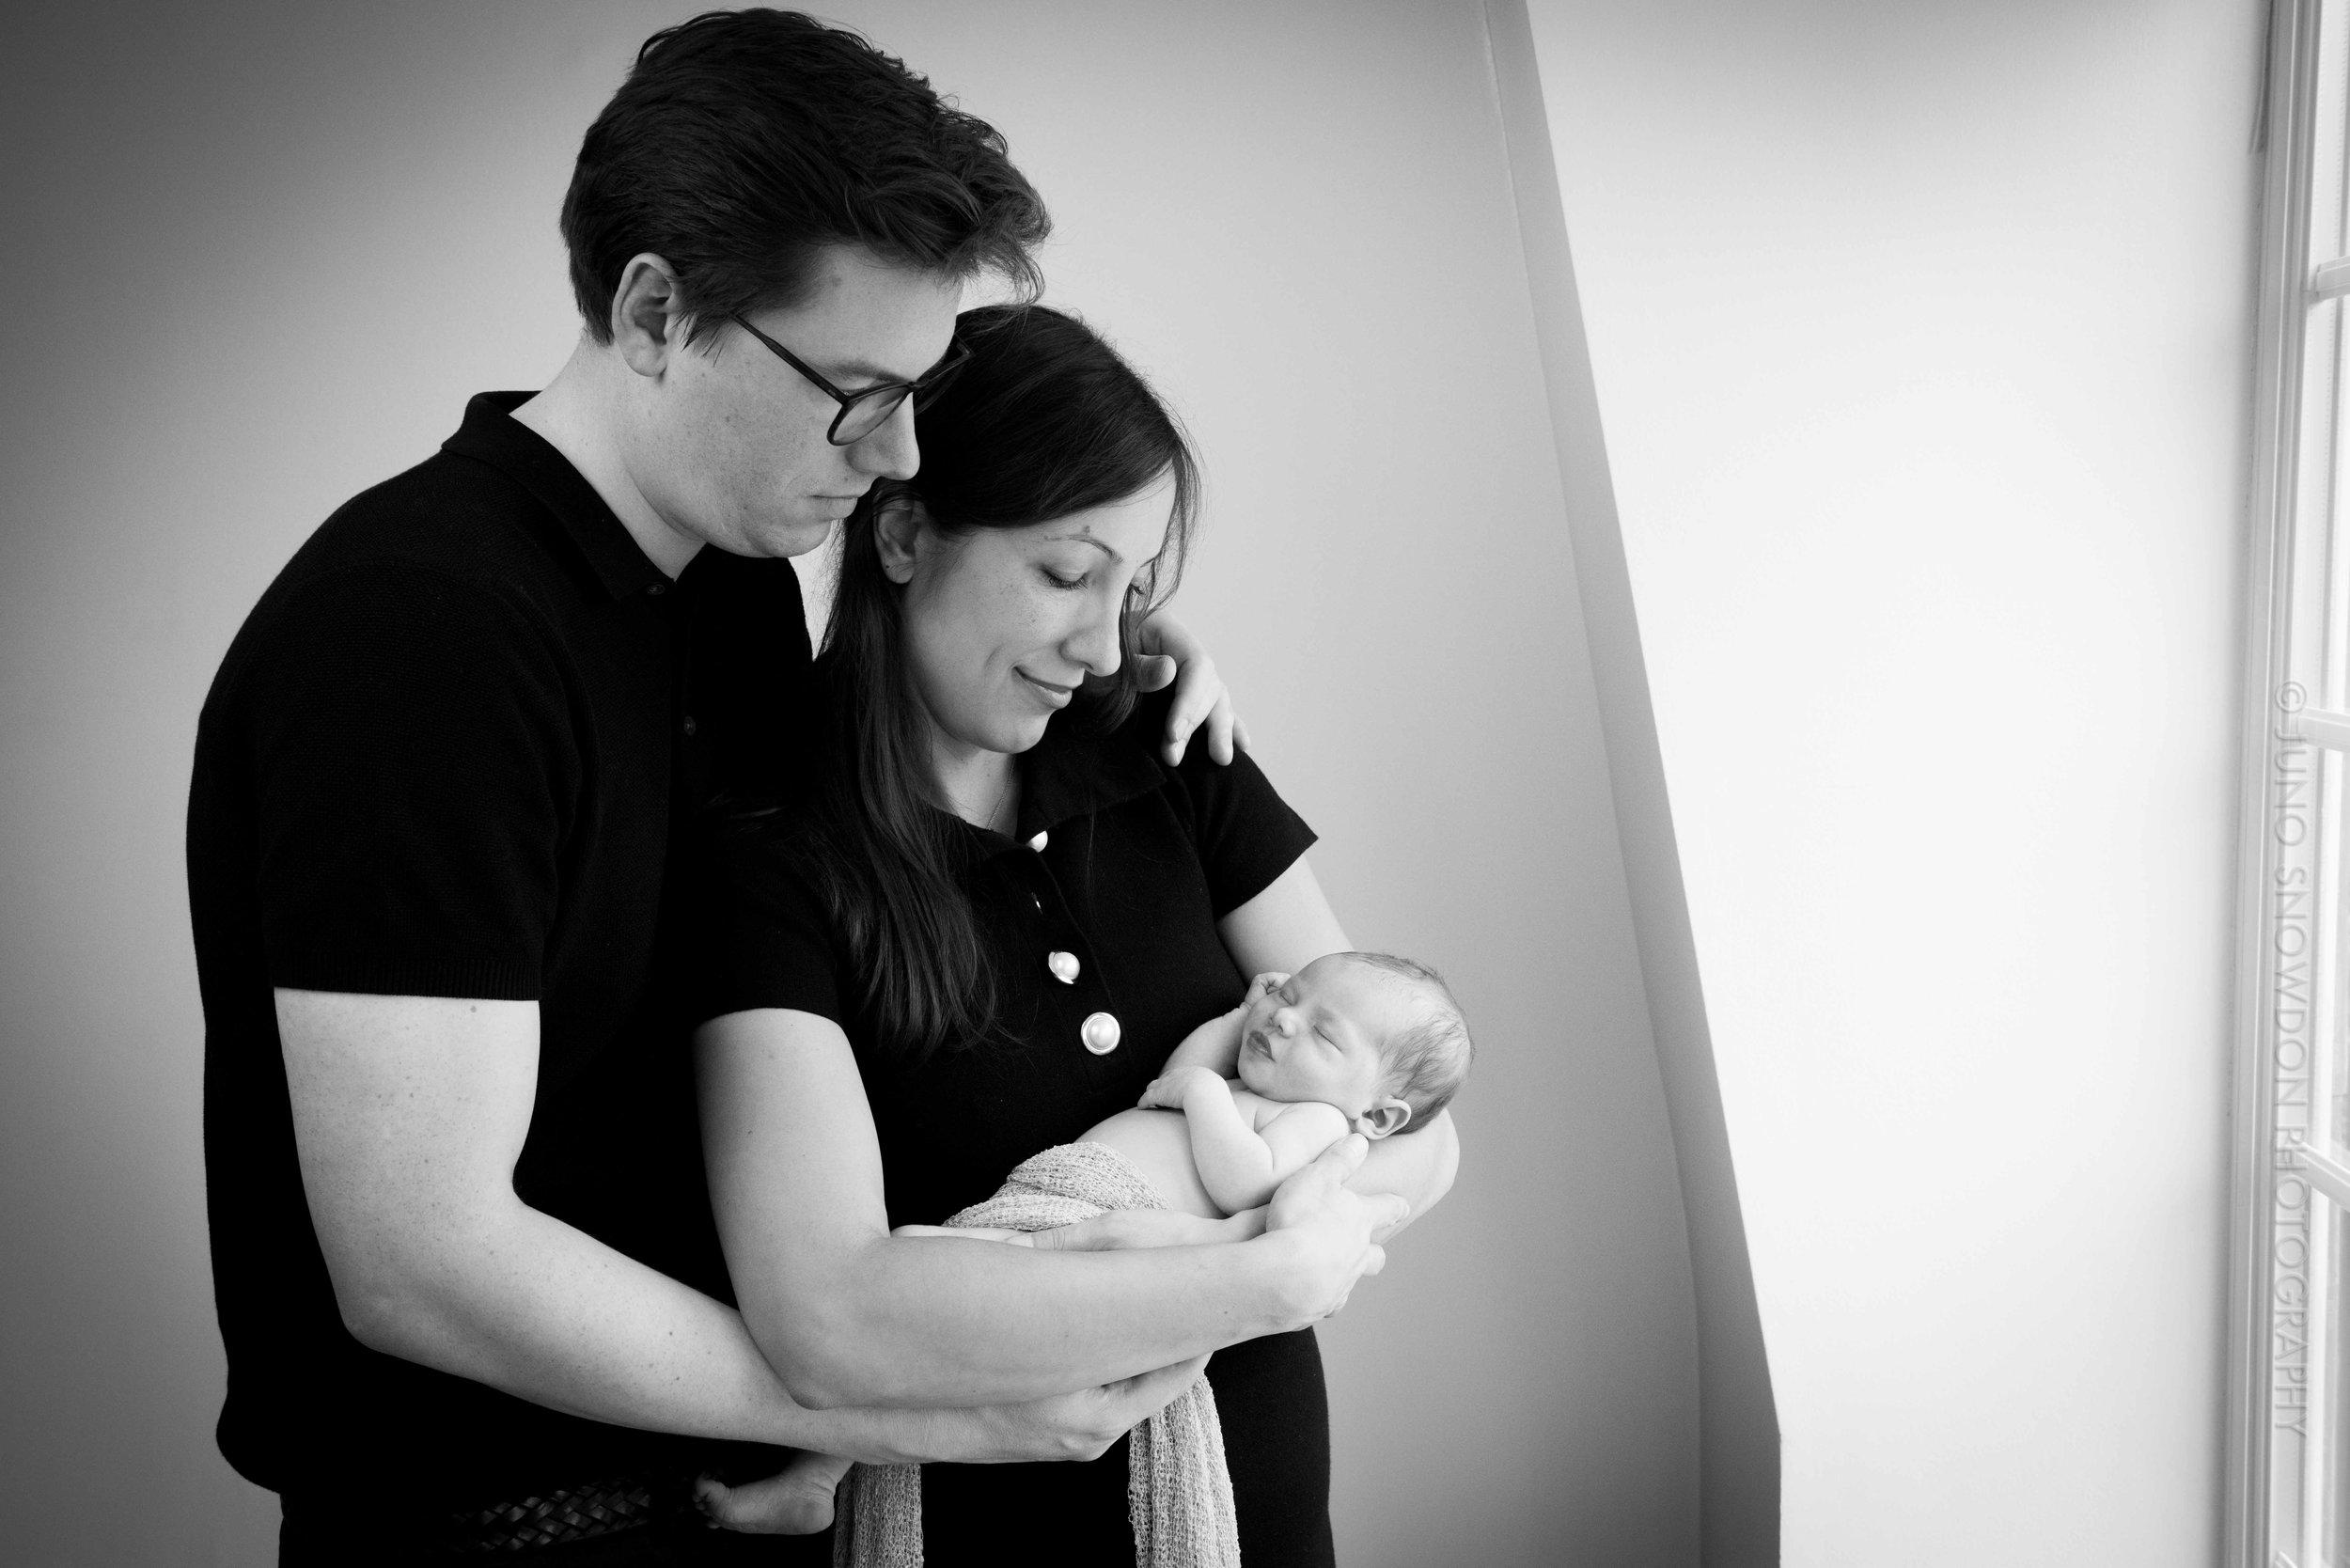 juno-snowdon-photography-newborn-portrait-7183.jpg